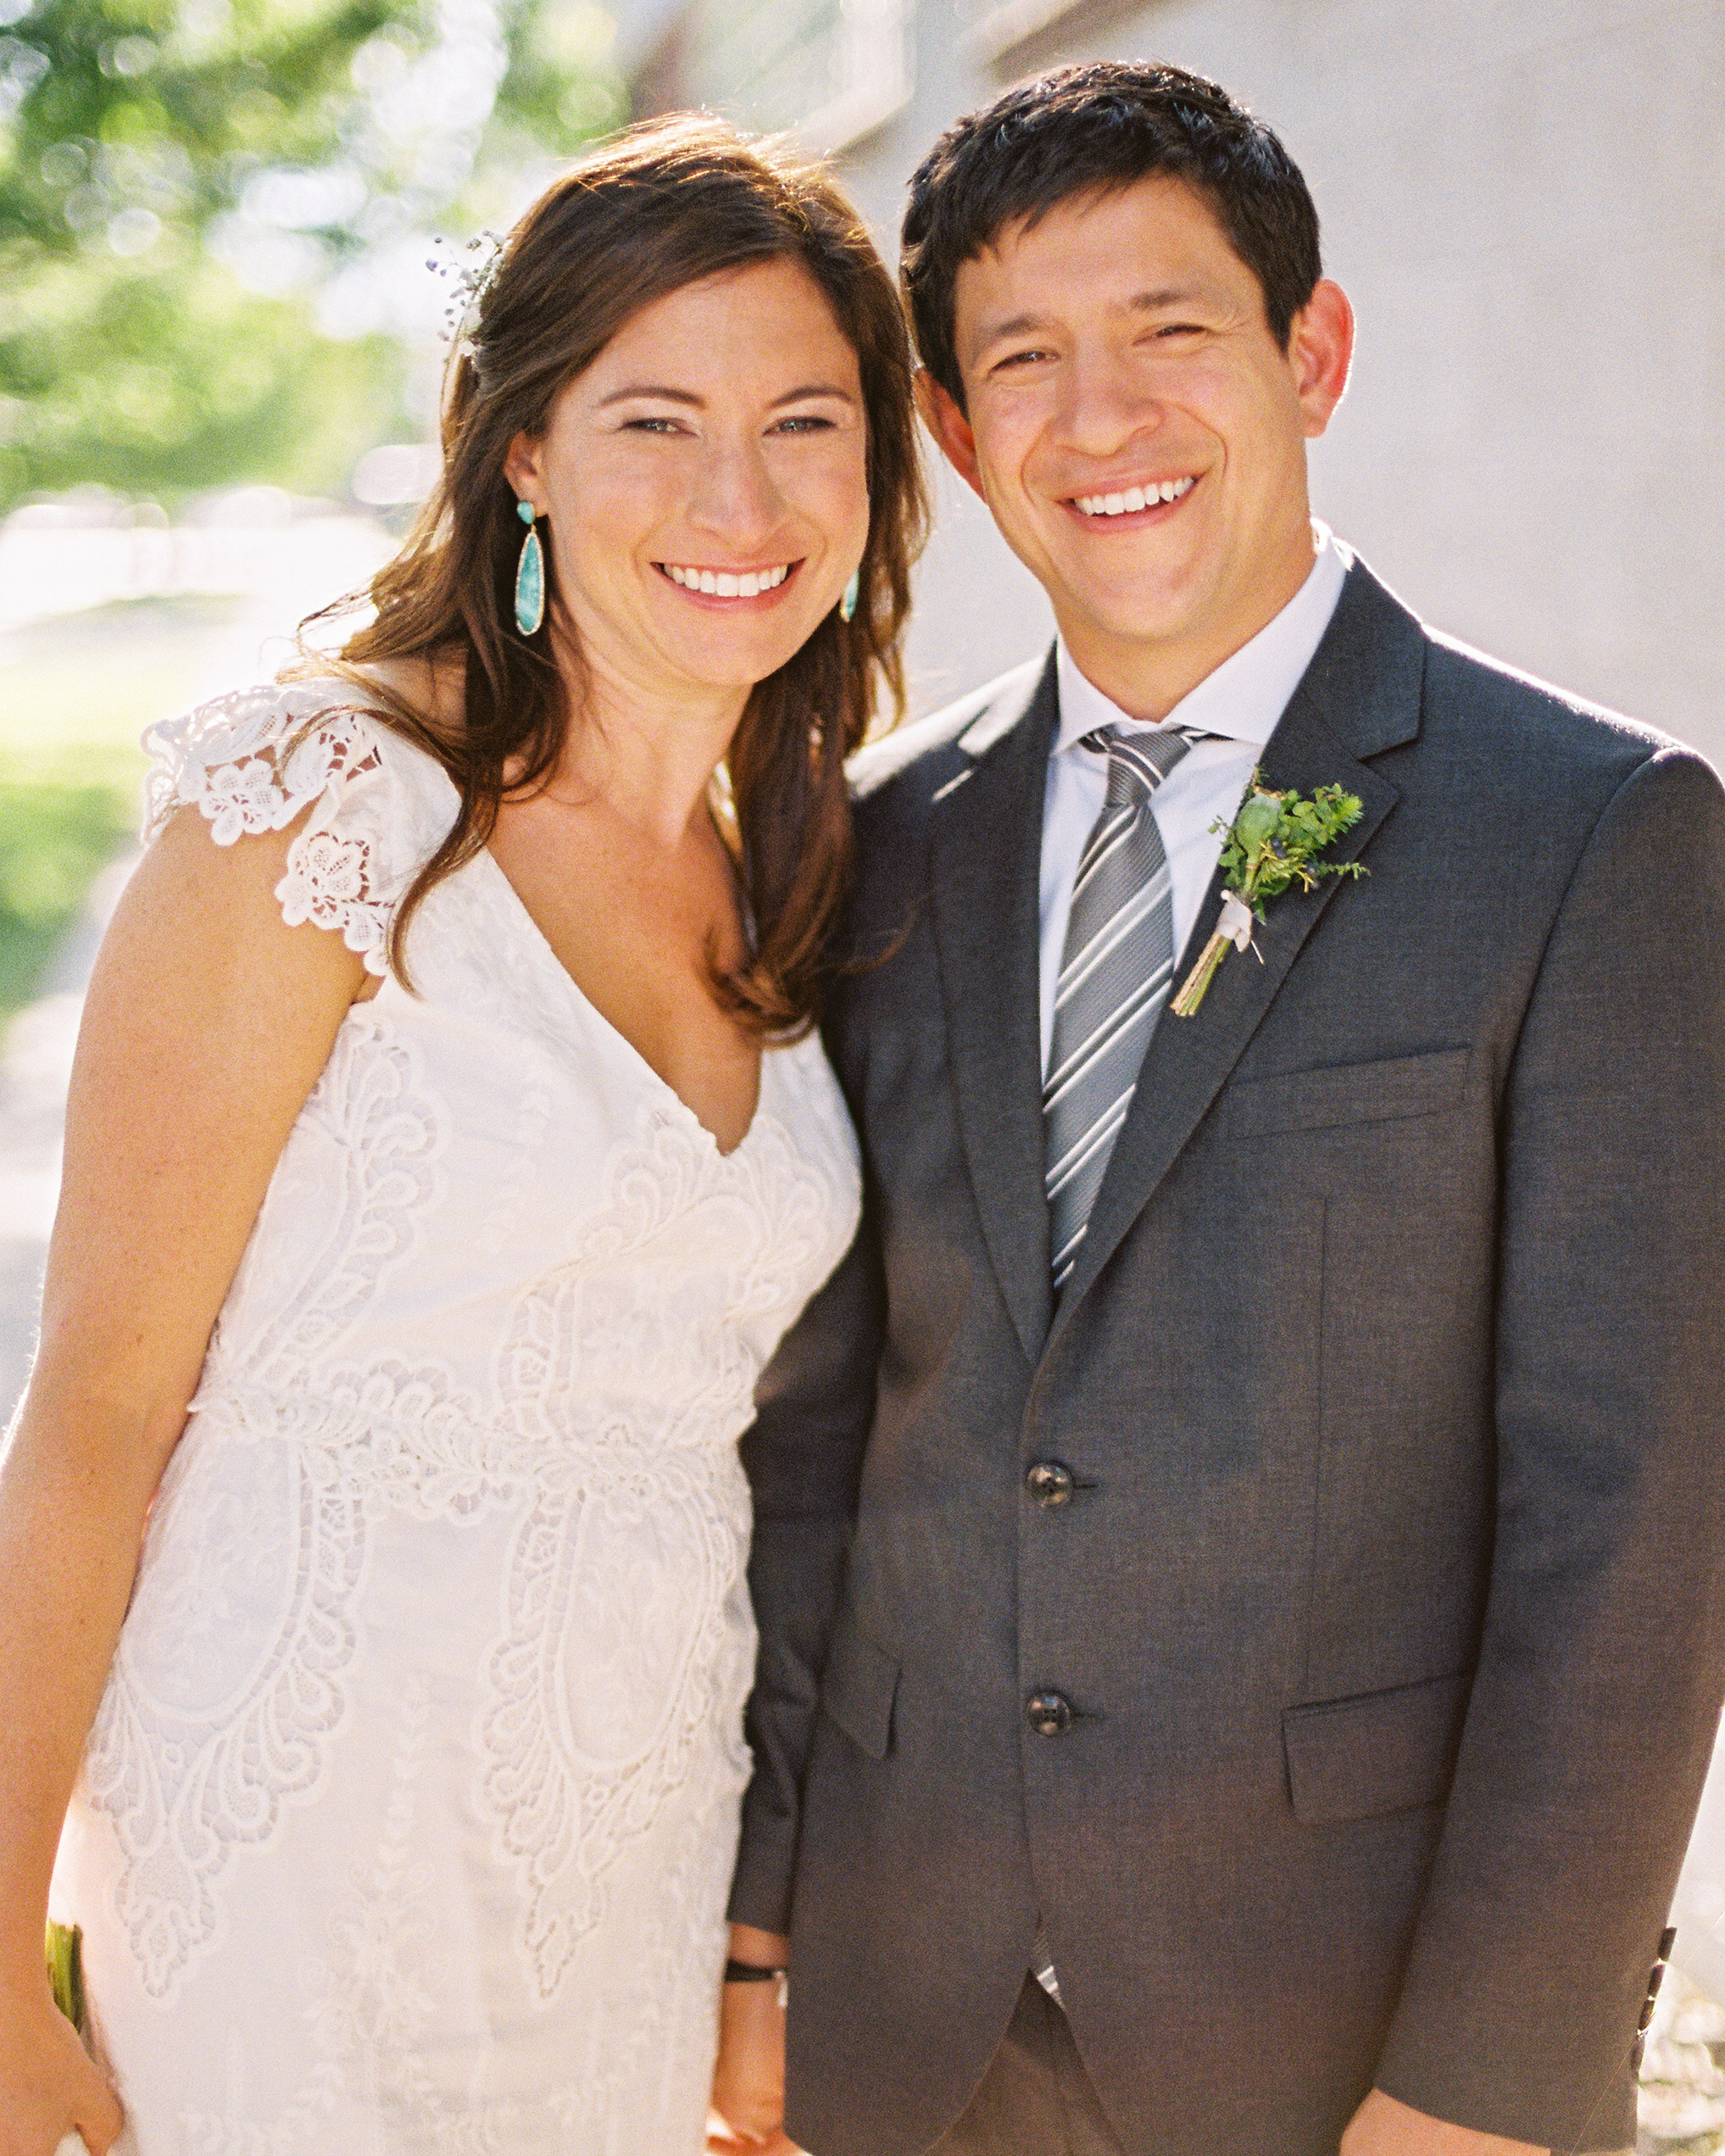 sydney-mike-wedding-couple-1-s111778-0215.jpg